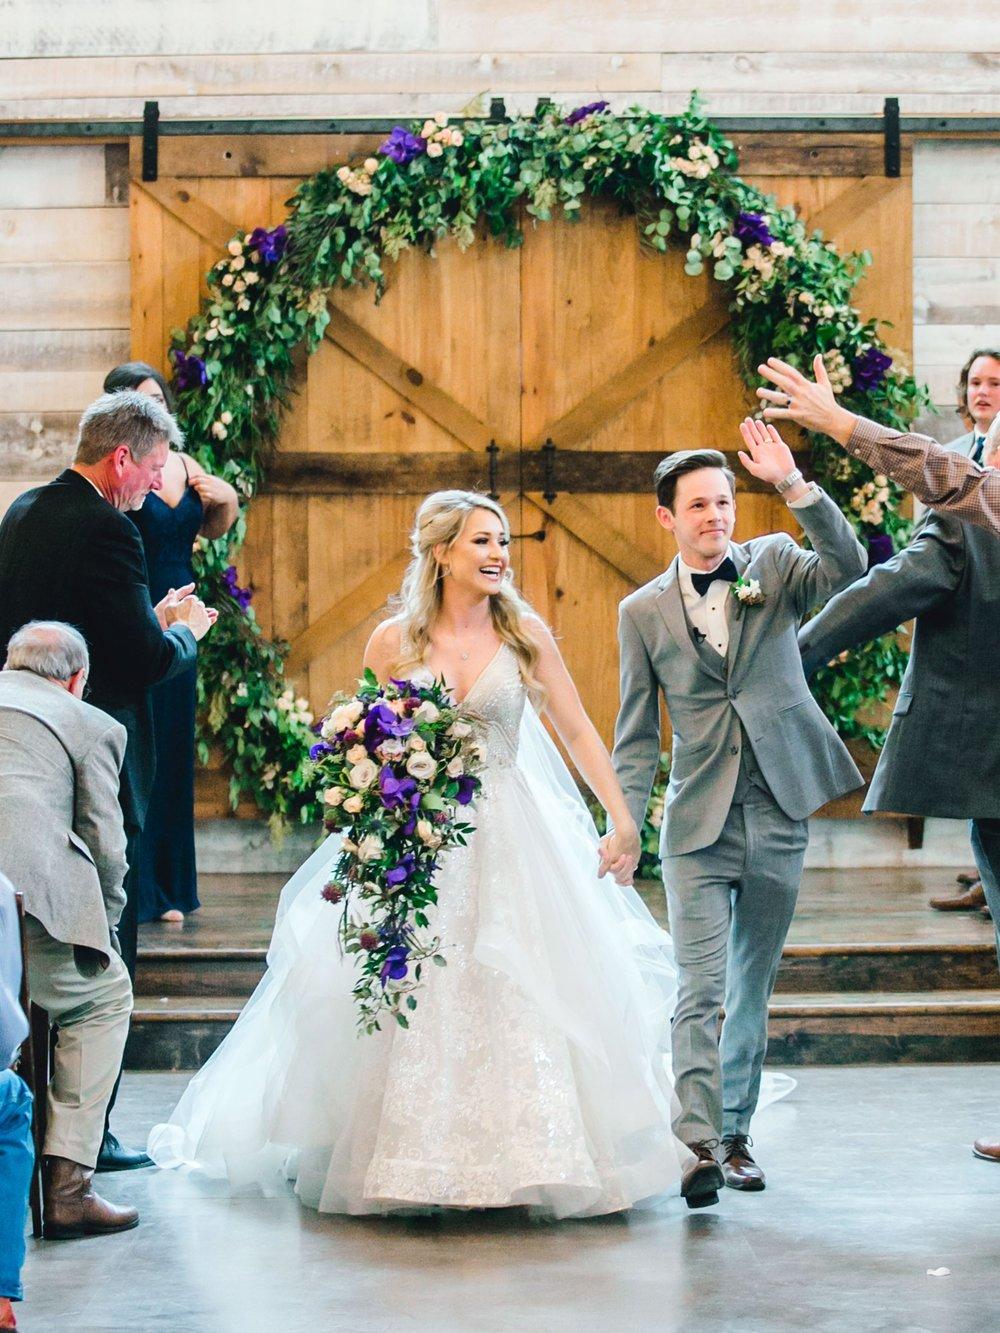 KAITLYN_AND_ZACHARY_HUNT_ALLEEJ_LUBBOCK_WEDDING_PHOTOGRAPHER_EBERLEY_BROOKS_EVENTS_0124.jpg